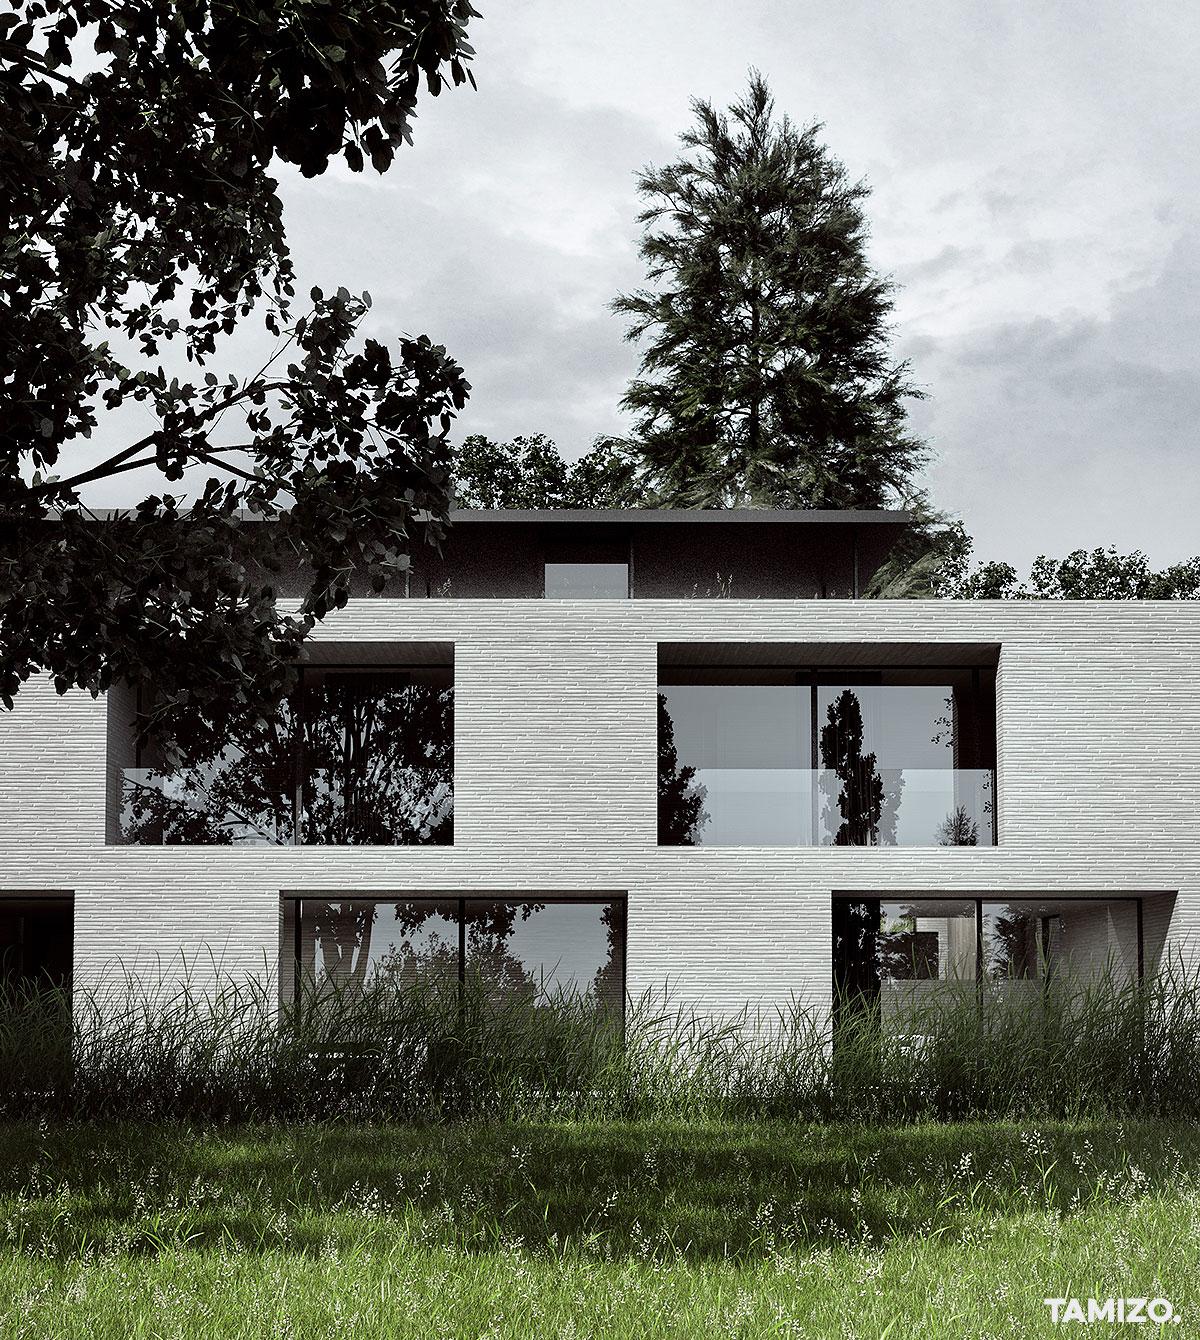 A061_tamizo_architects_competition_tbilisi_georgia_multifamily_houseing_realestate_18